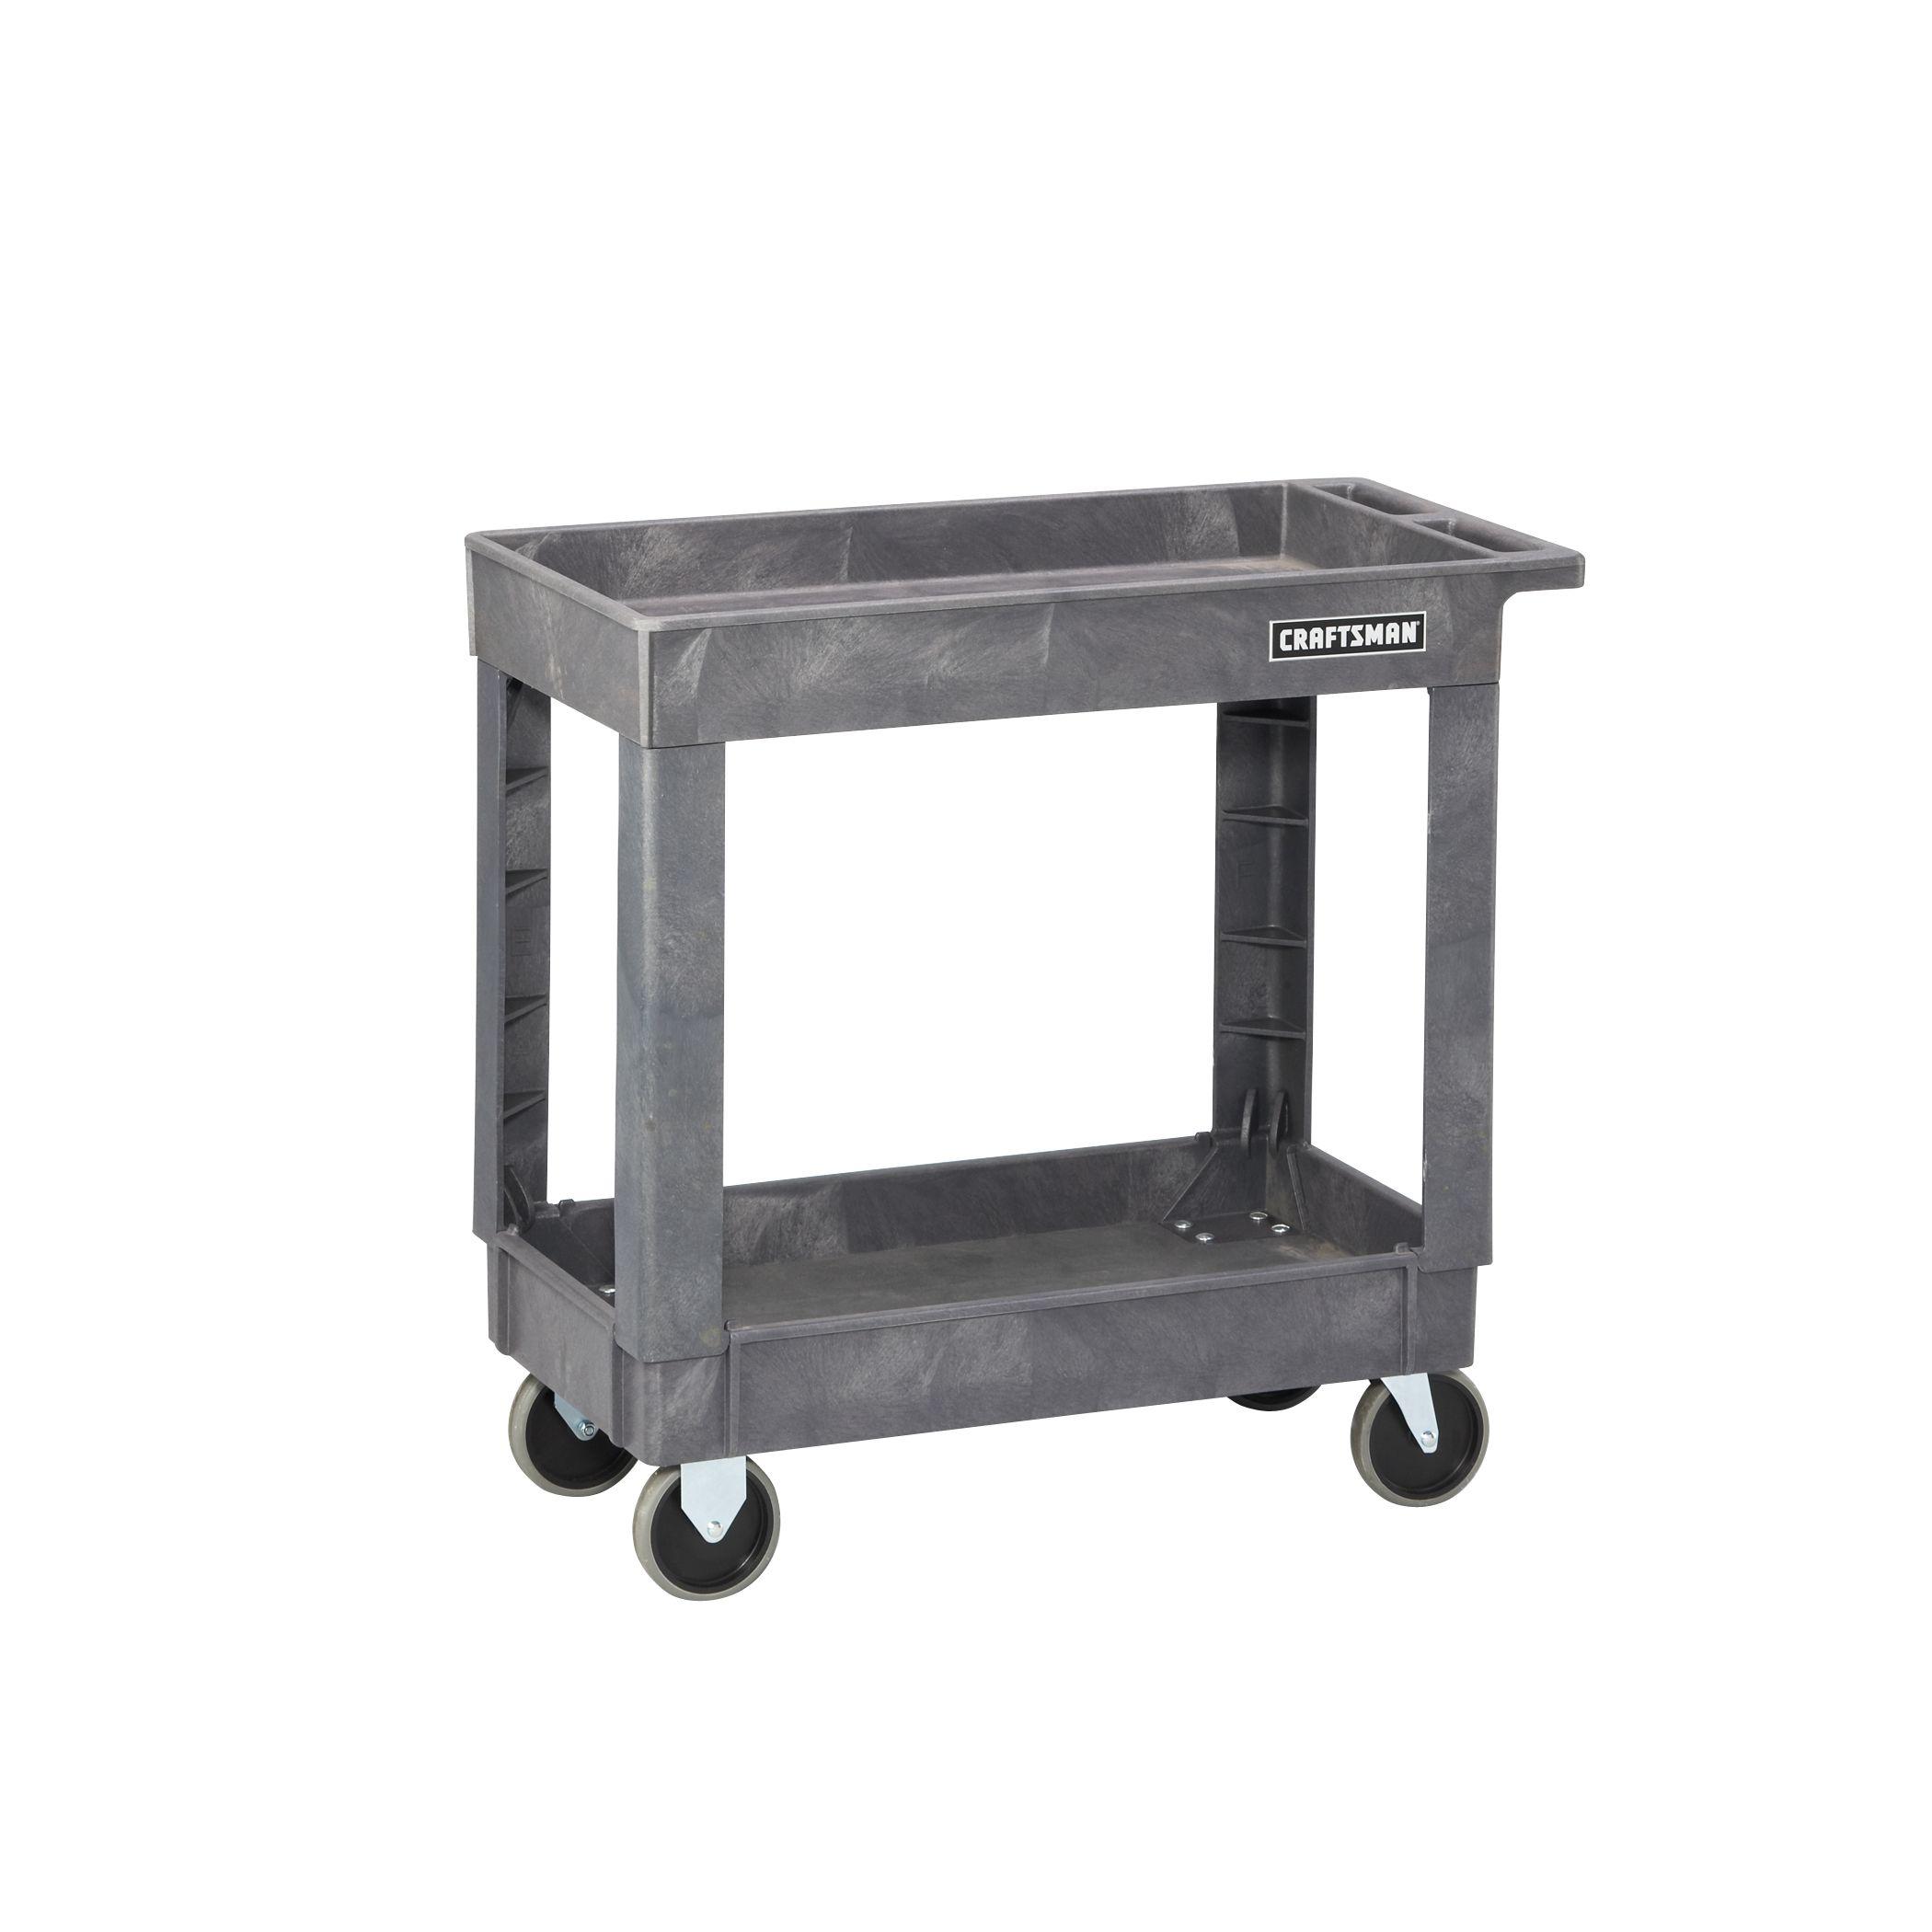 Sears - Craftsman 2-Shelf Heavy-Duty Utility Cart - $67.66 + free shipping or store-pickup